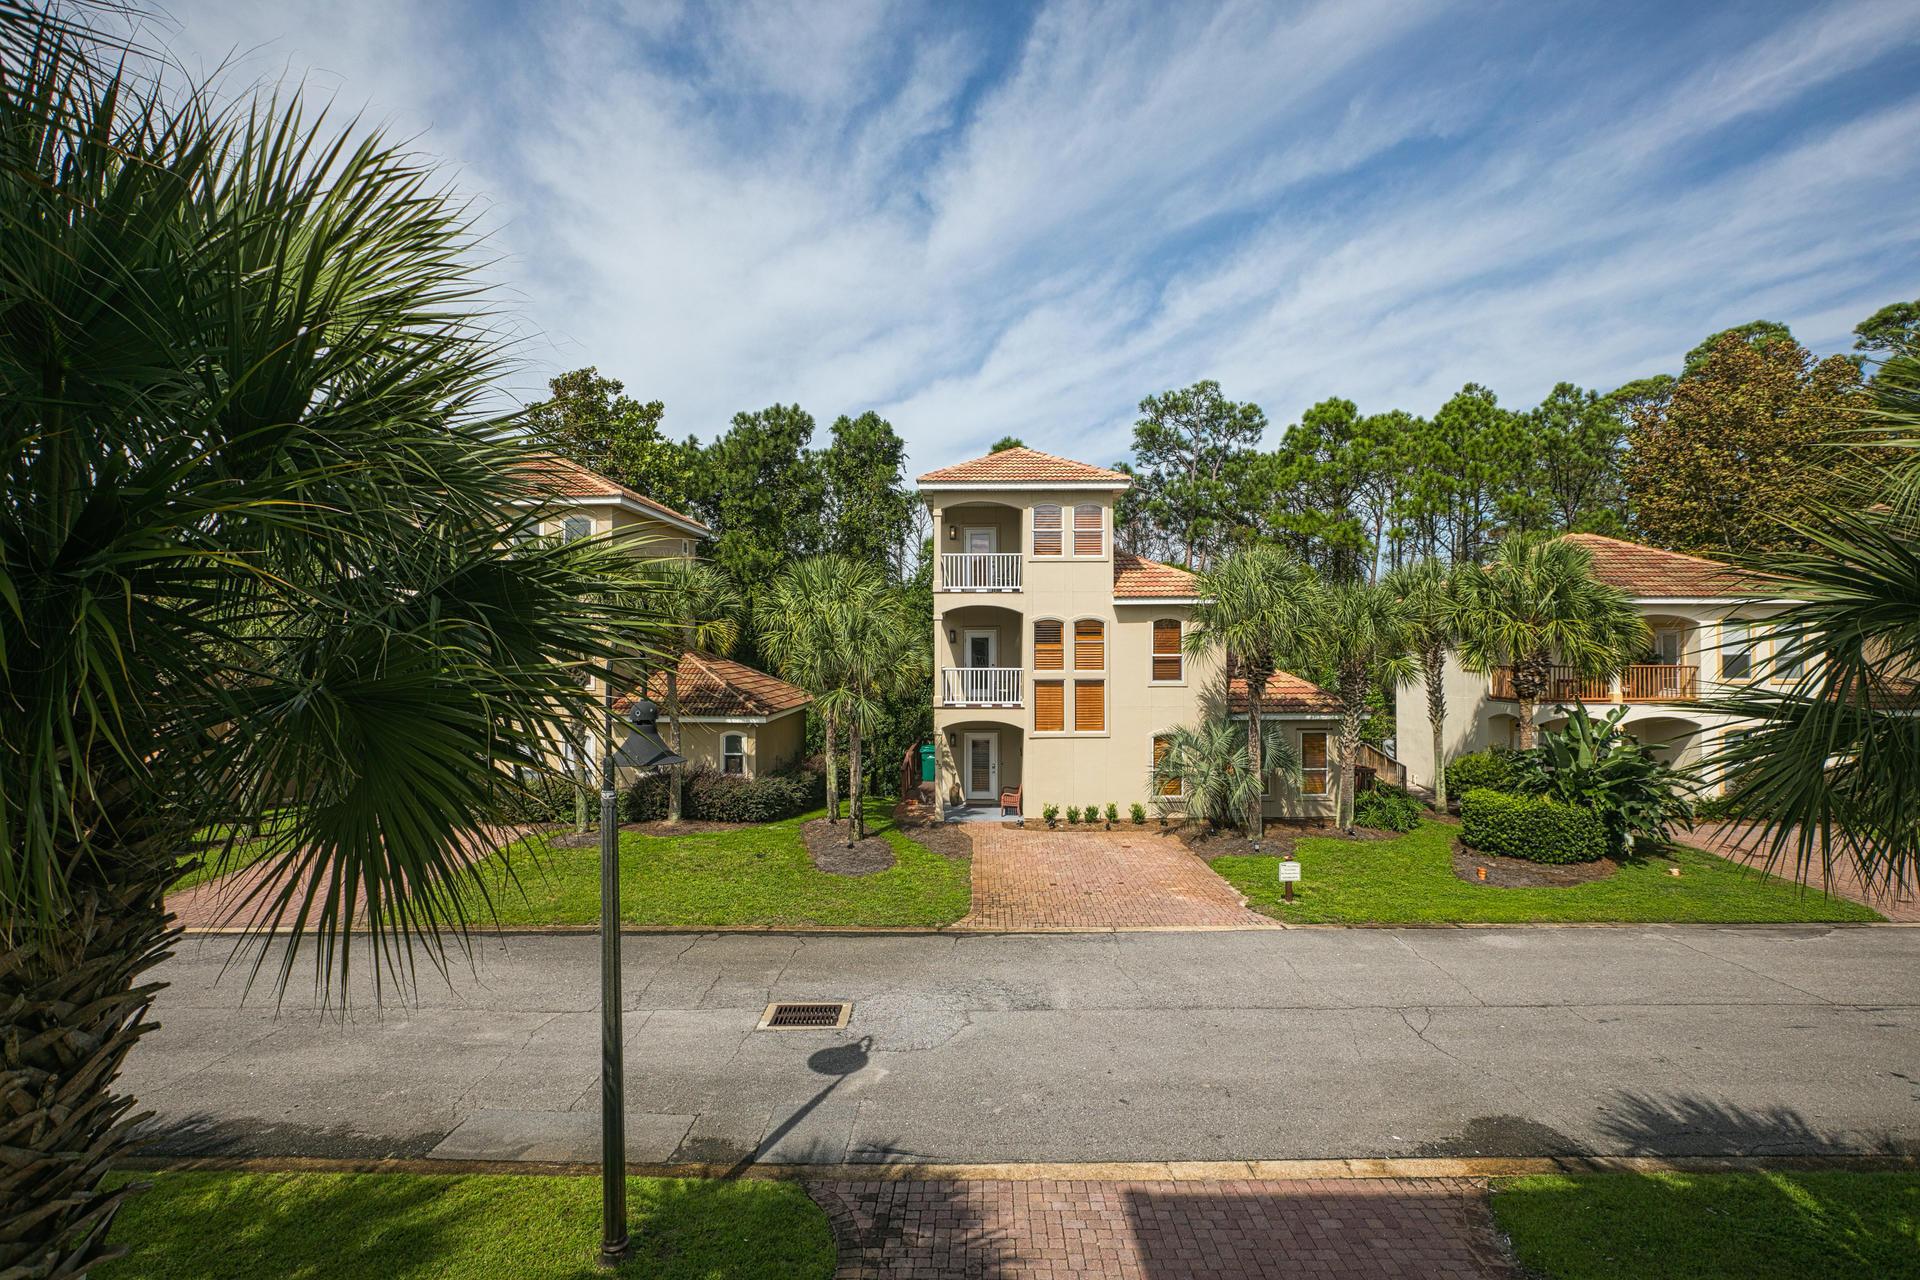 Photo of home for sale at 36 Las Palmas, Santa Rosa Beach FL